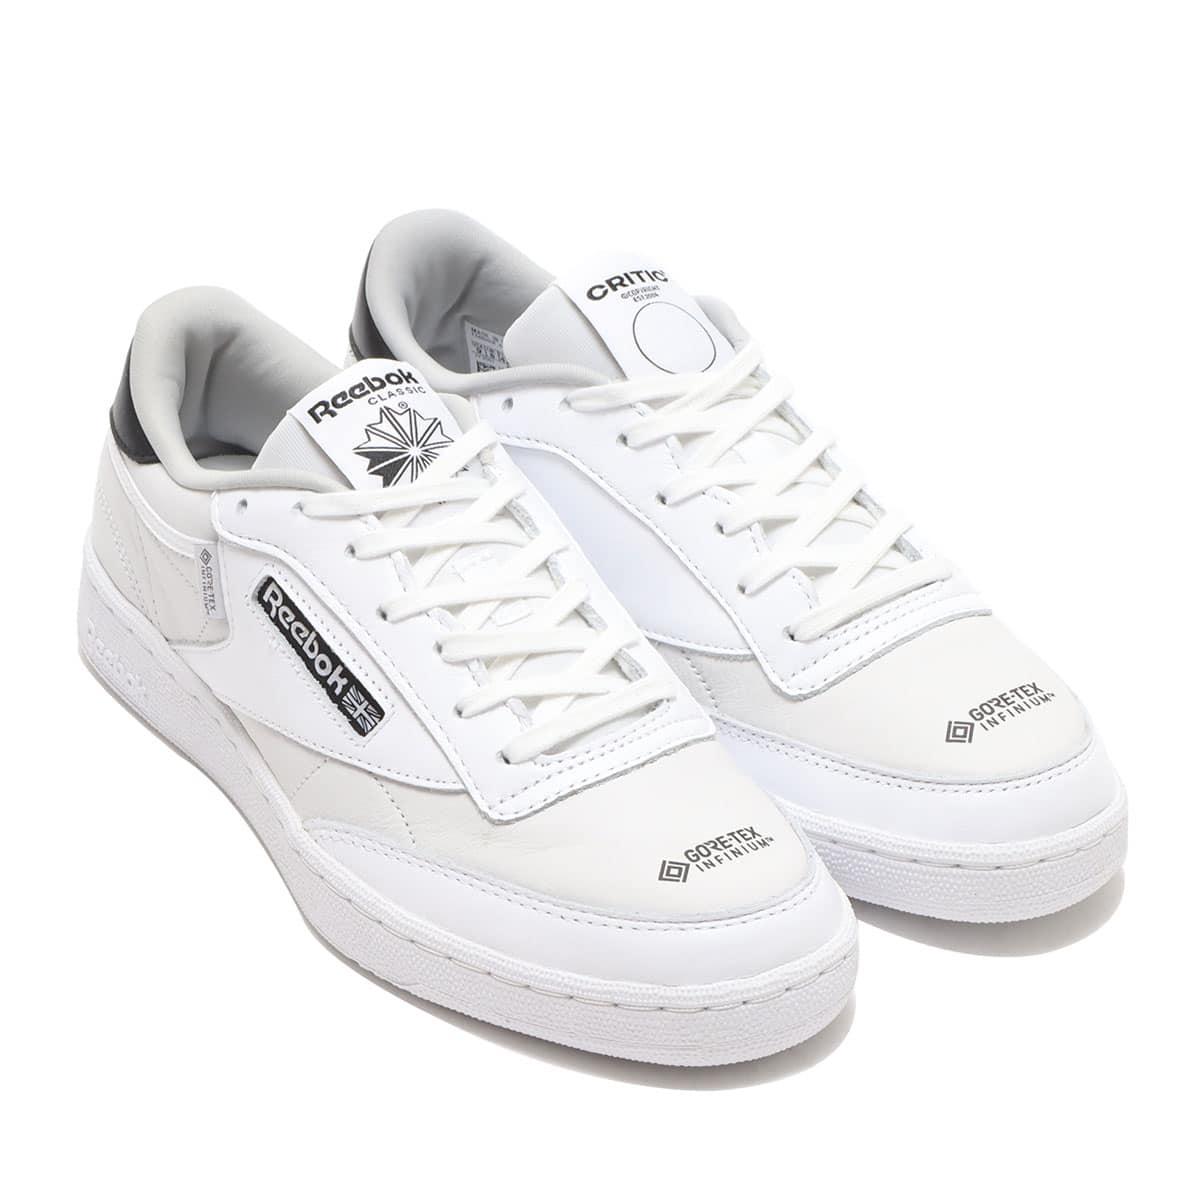 Reebok Club C 85 GTX FOOTWEAR WHITE/CORE BLACK/PURE GRAY 21FW-S_photo_large